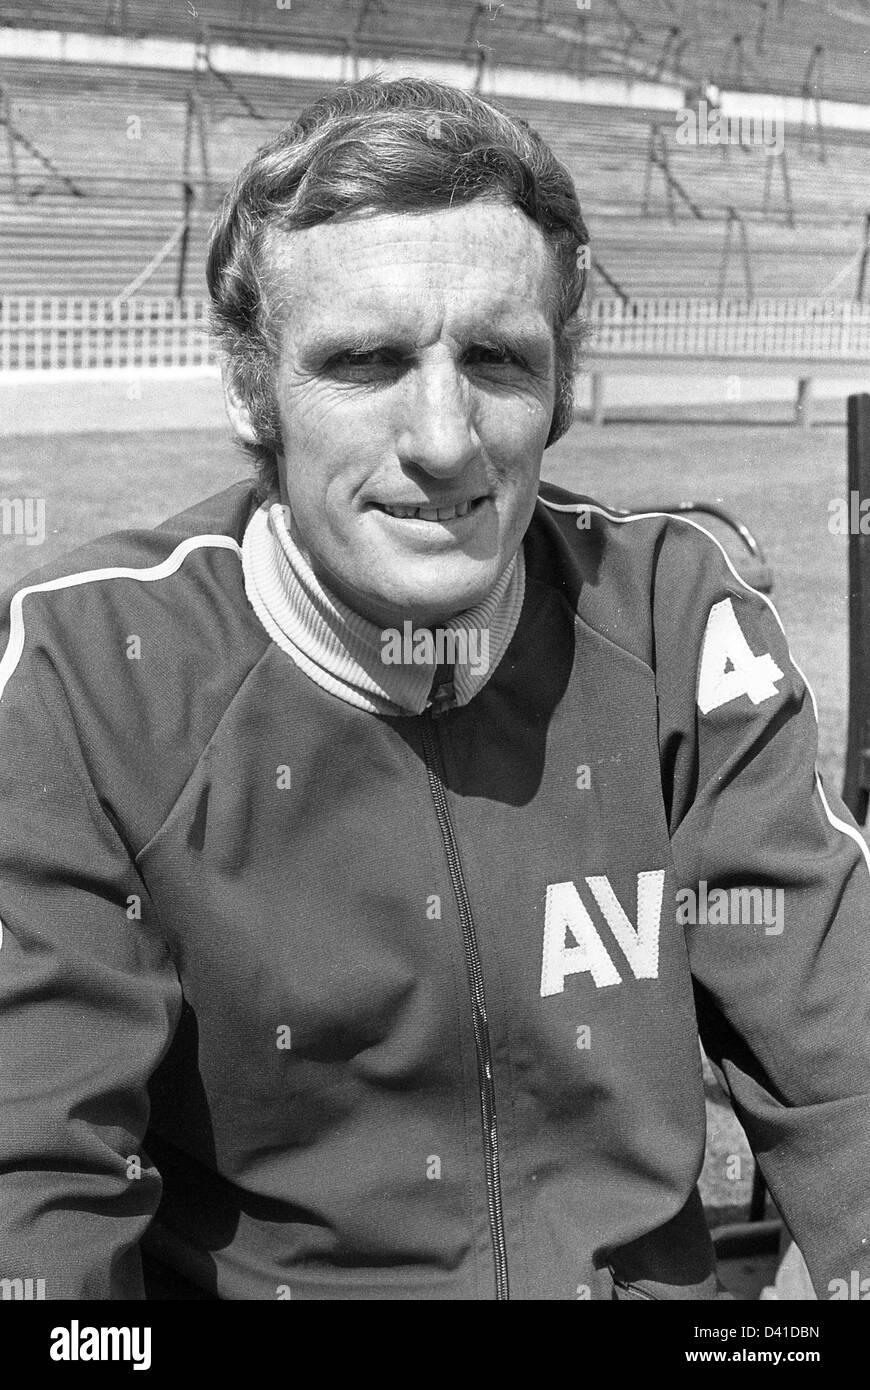 Vic Crowe Aston Villa football manager 1971 - Stock Image